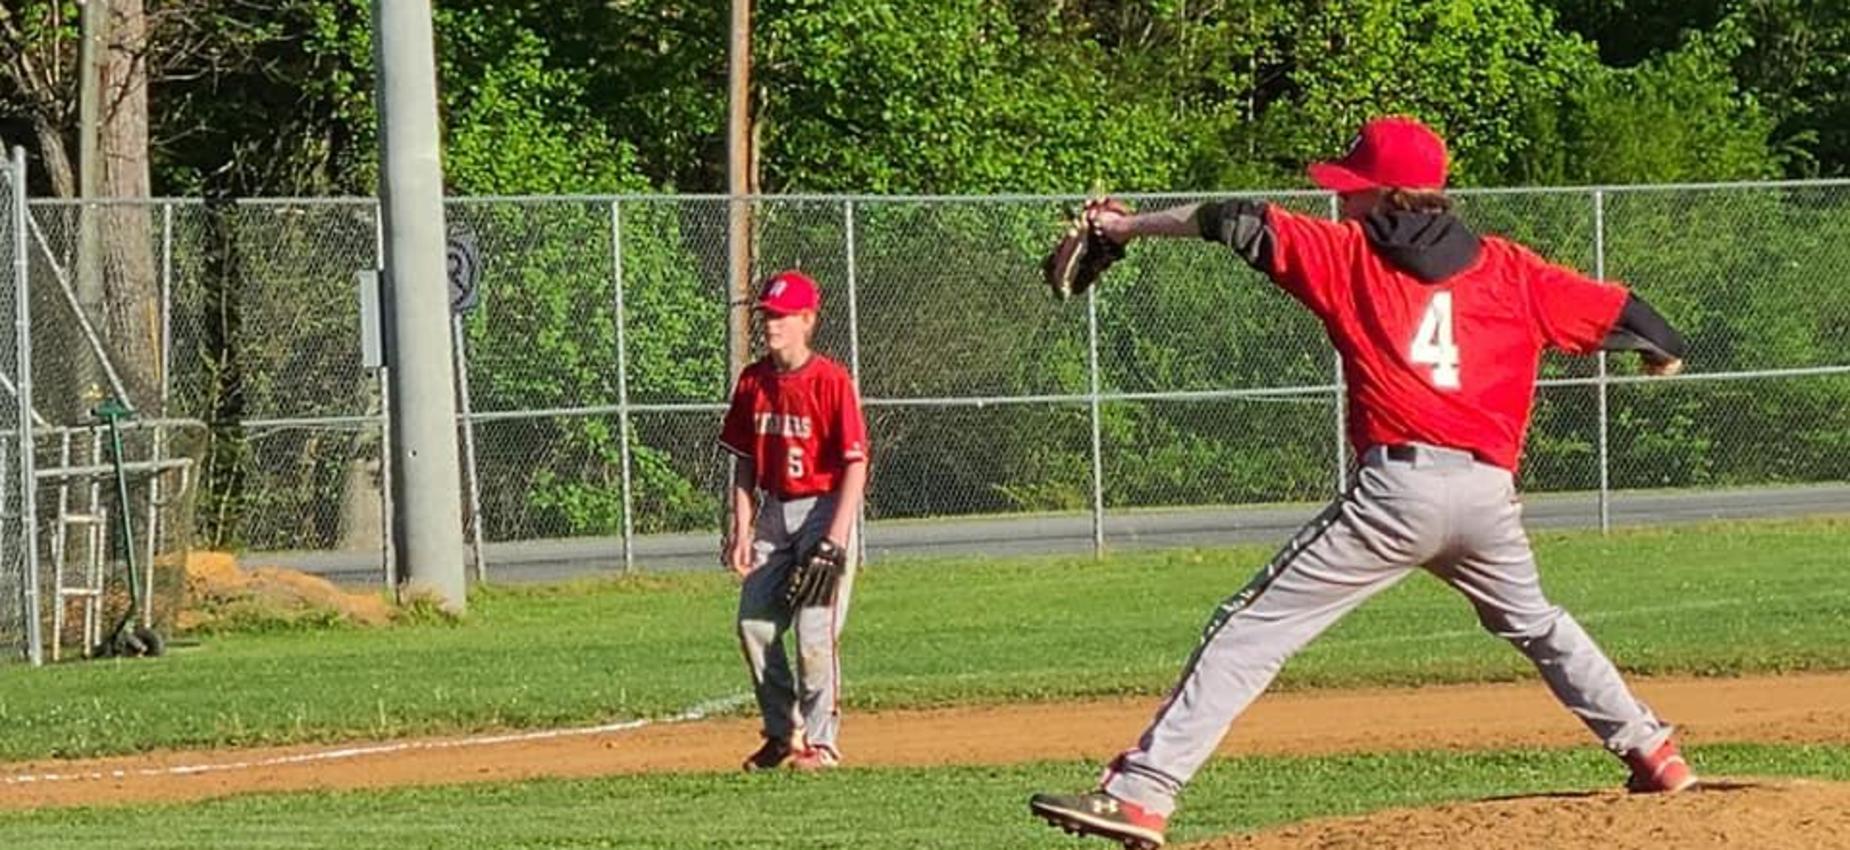 A pitcher throws a baseball.